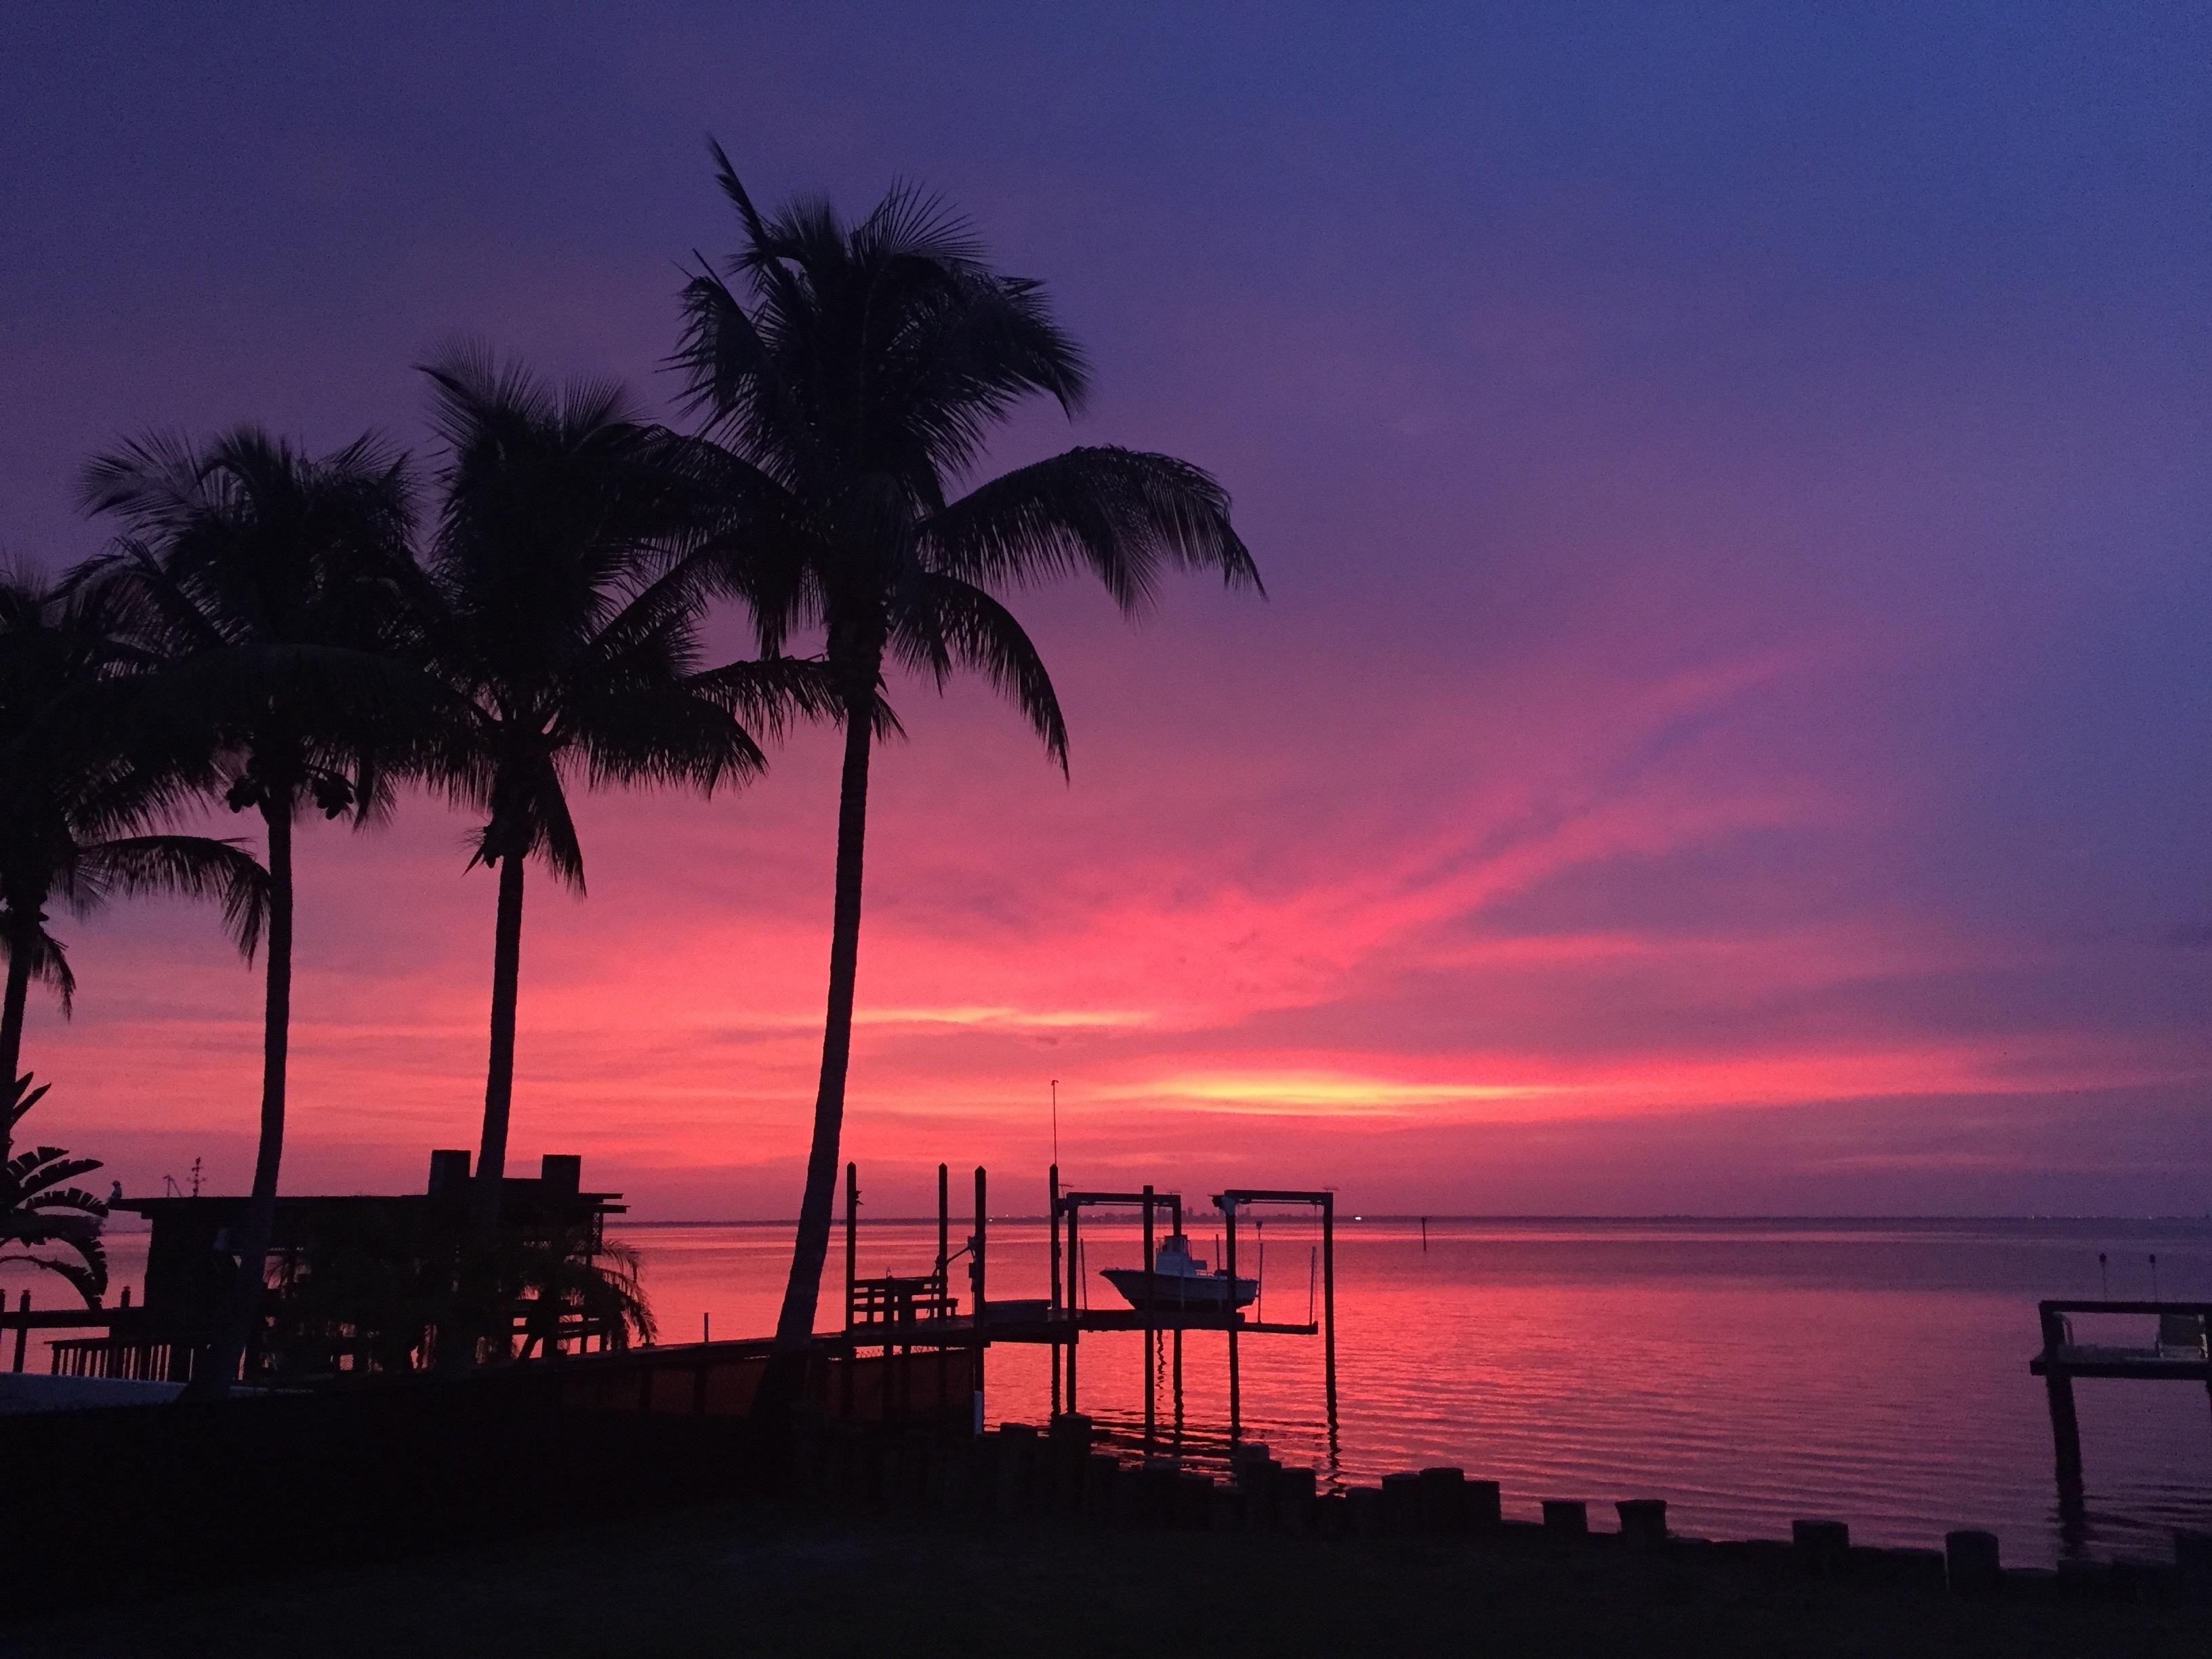 Beach Sea Coast Ocean Horizon Sunrise Sunset Morning Dawn Dusk Evening Pink Sky Palms Silhouettes Florida